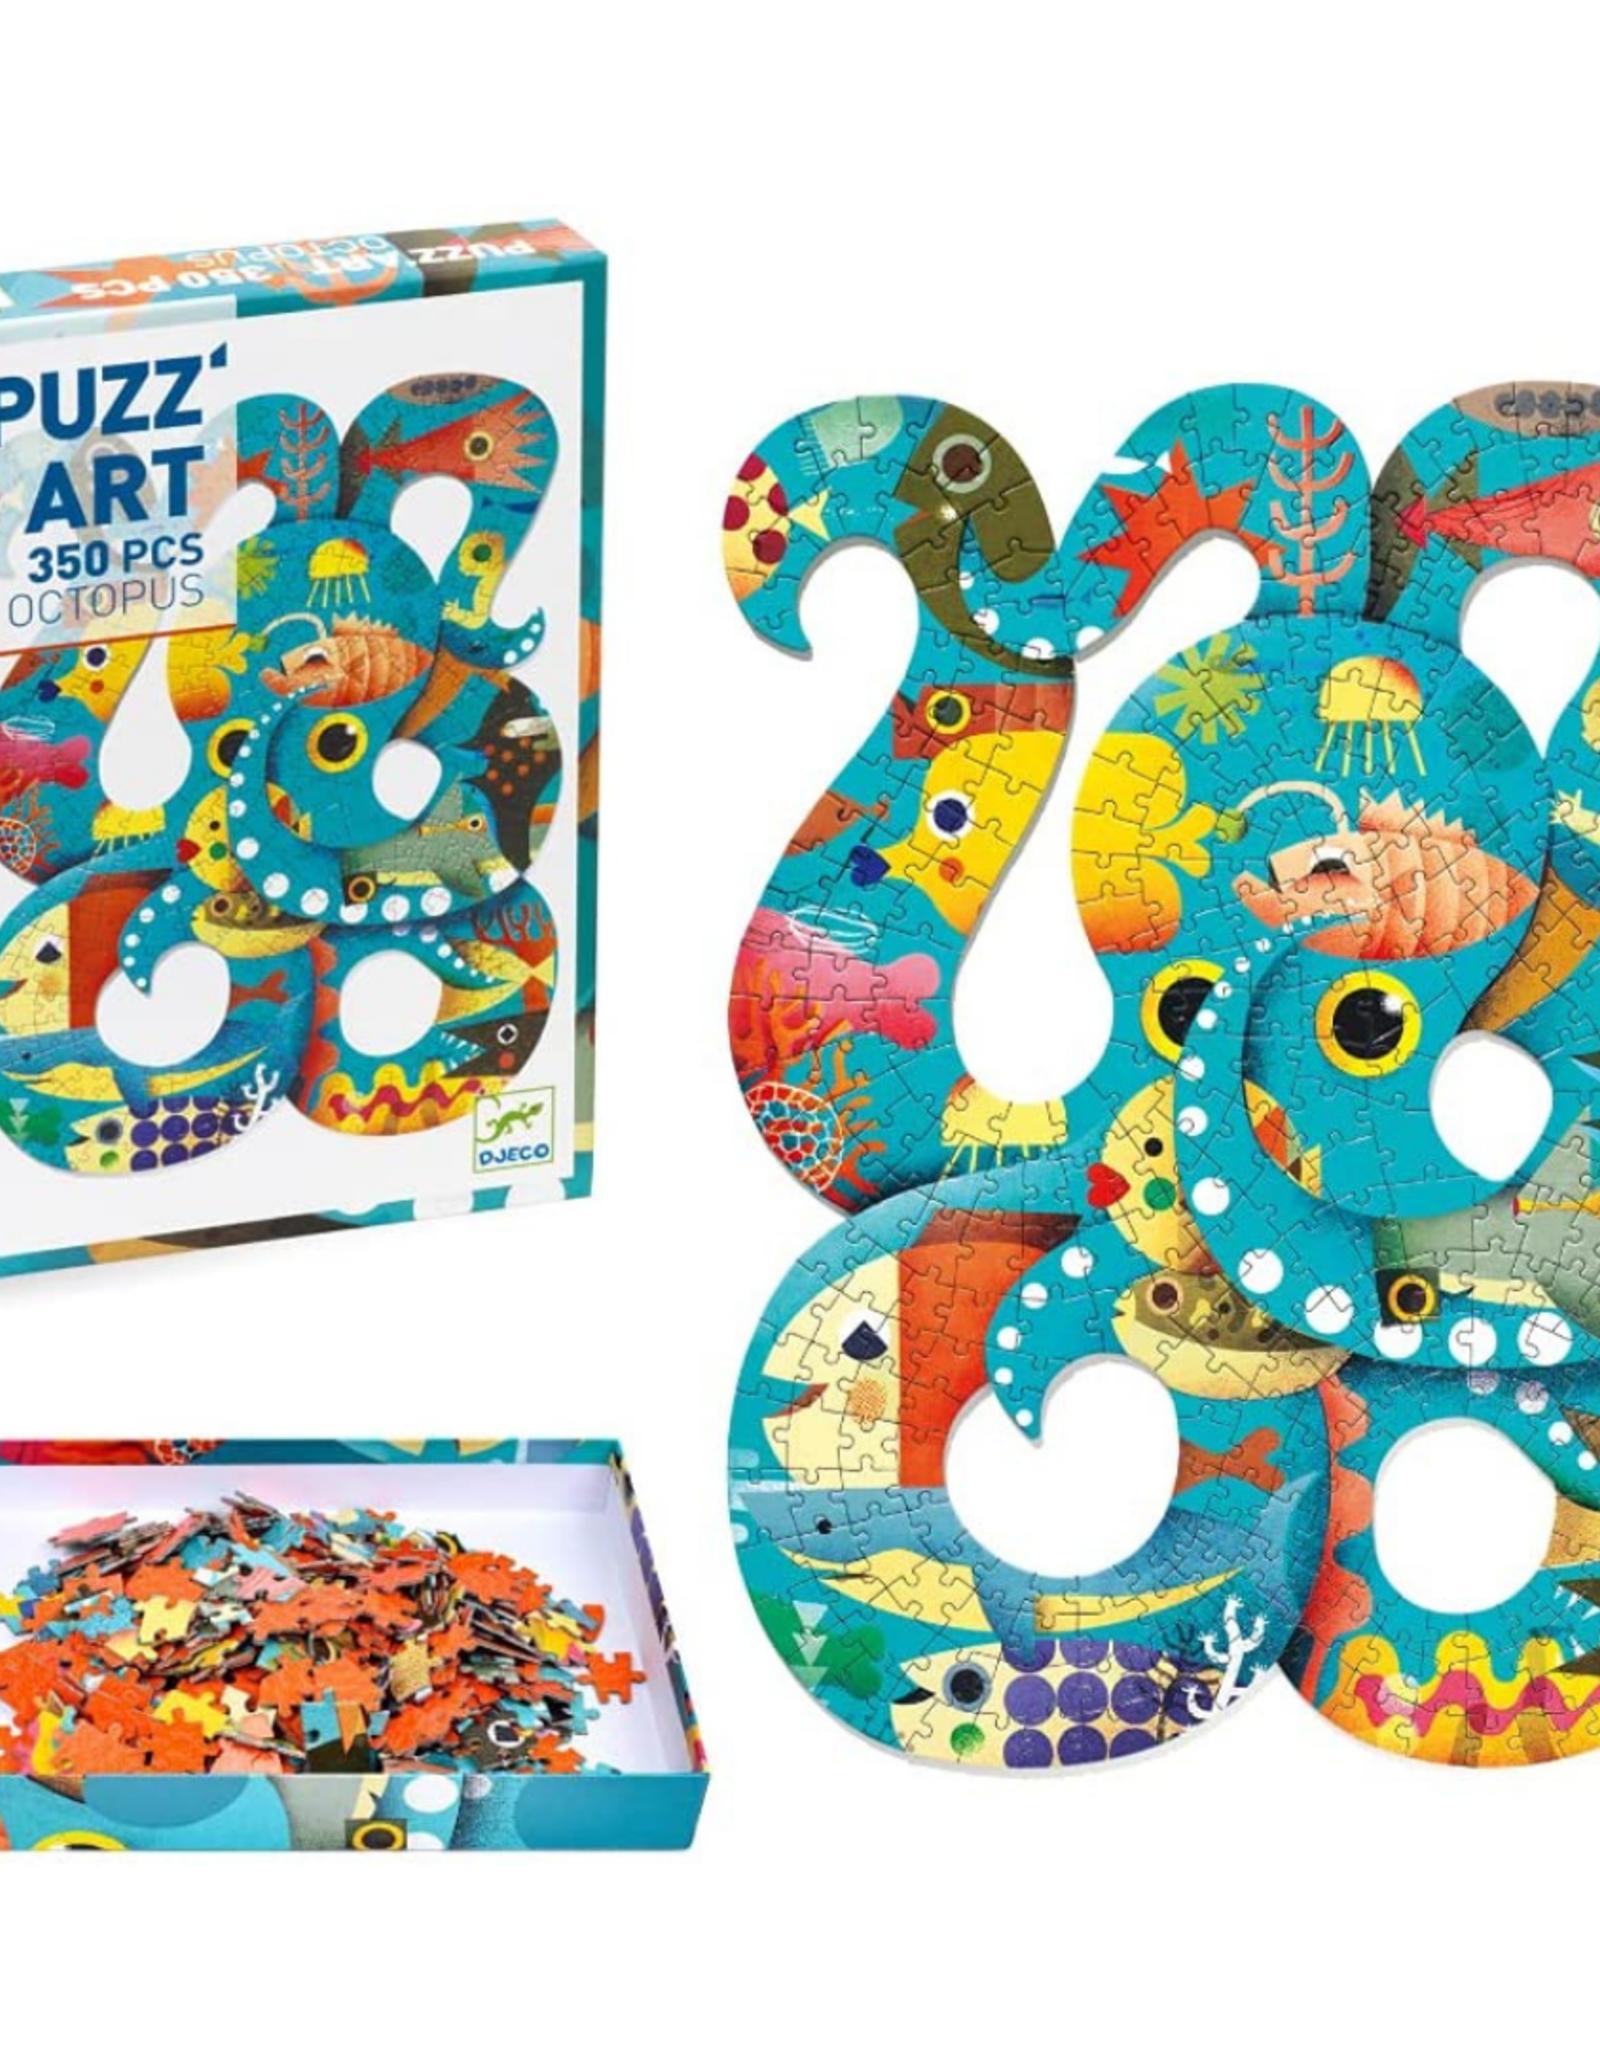 Djeco Puzz'Art Octopus, 350 pcs